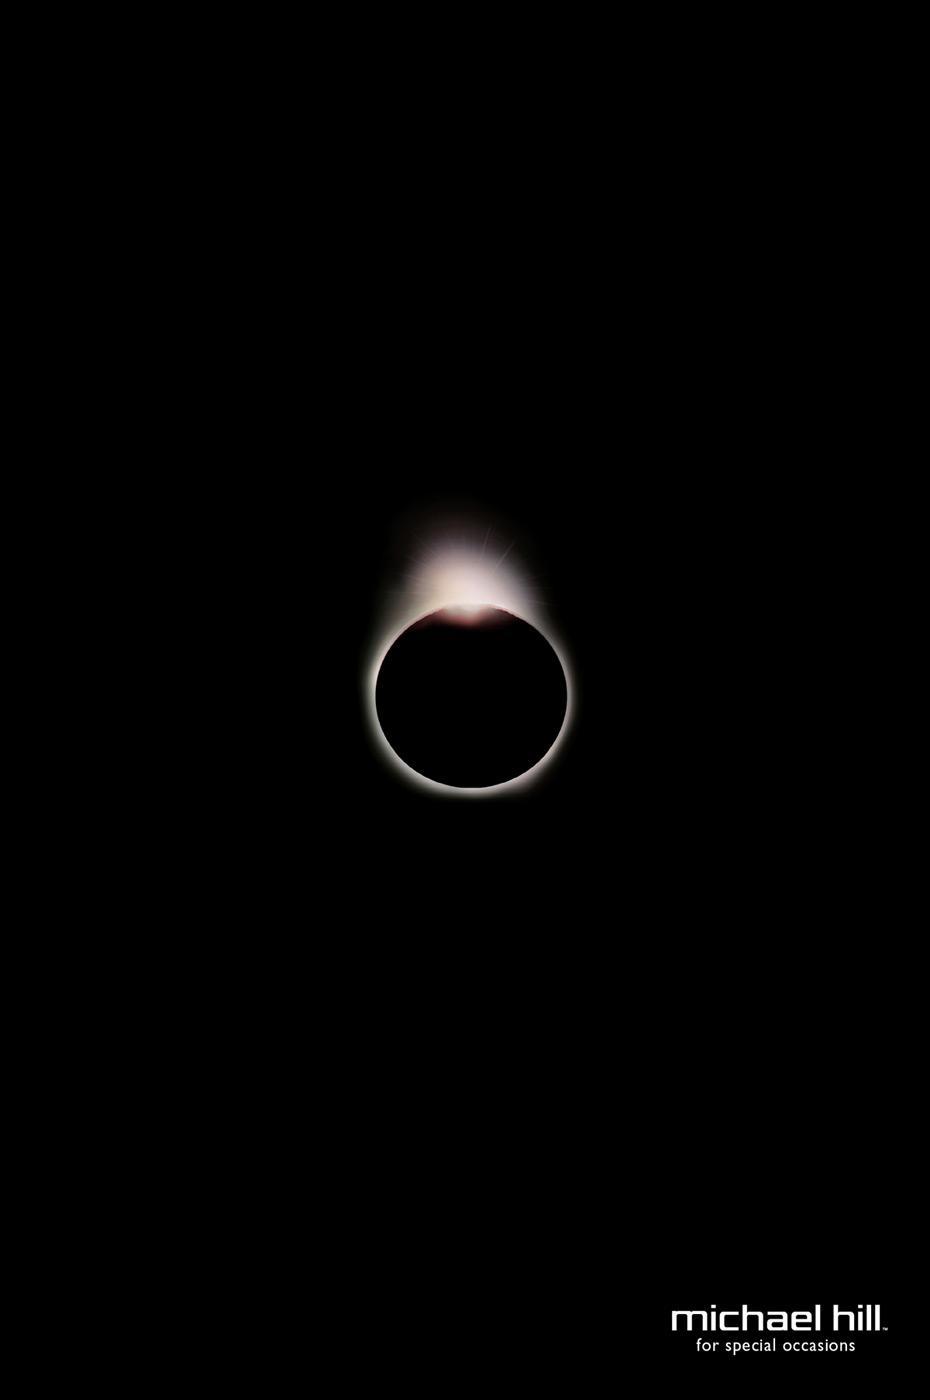 Michael Hill Print Ad -  Eclipse